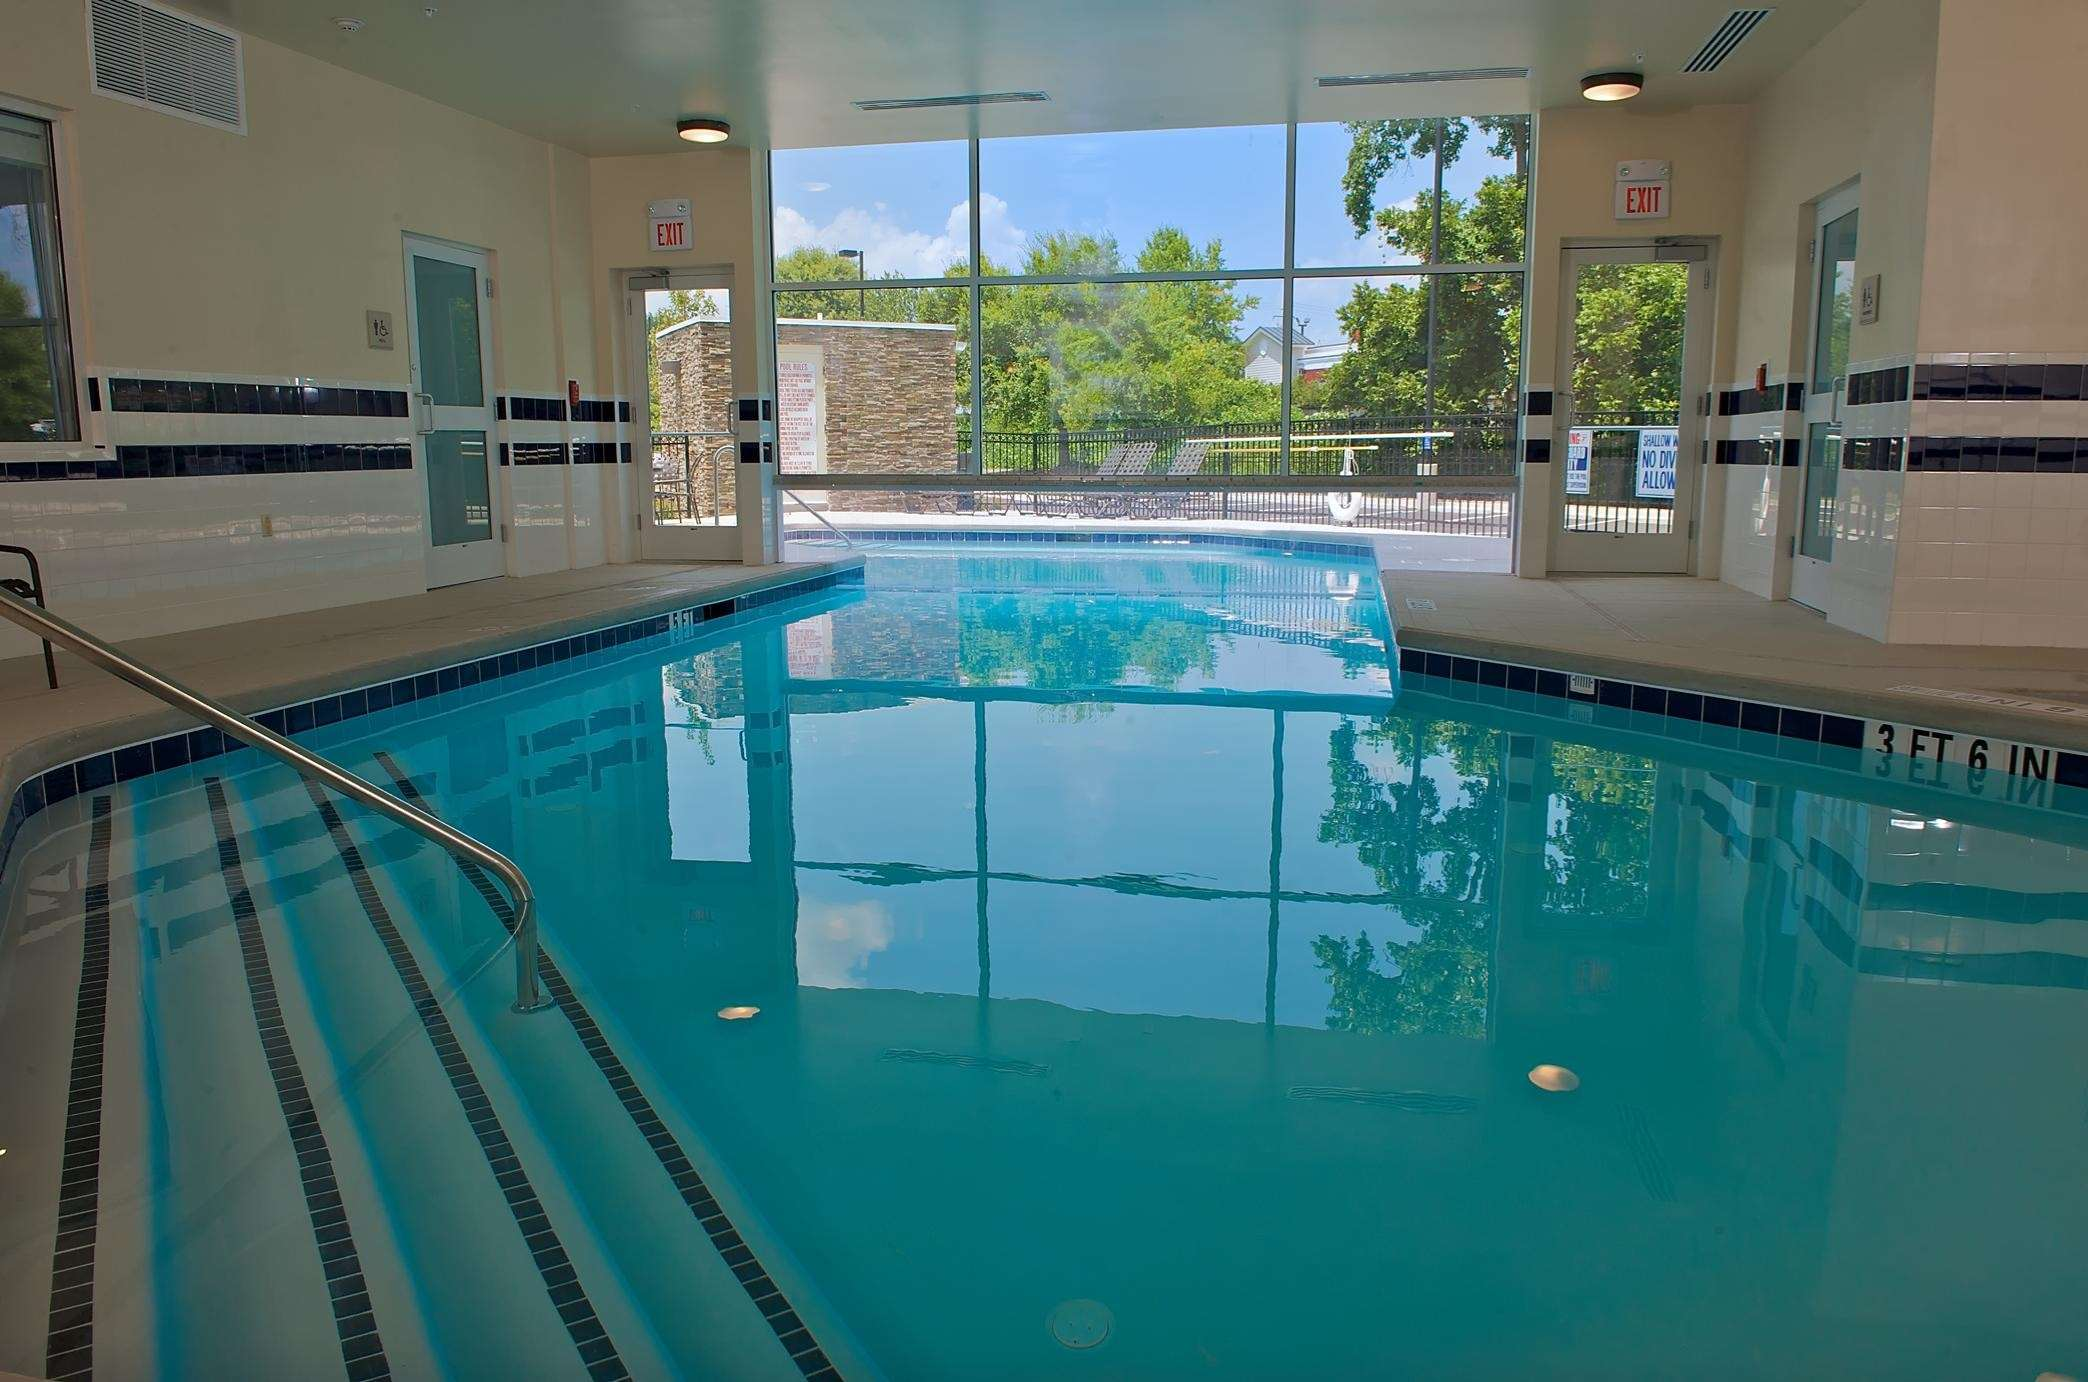 Hilton Garden Inn Gainesville image 22